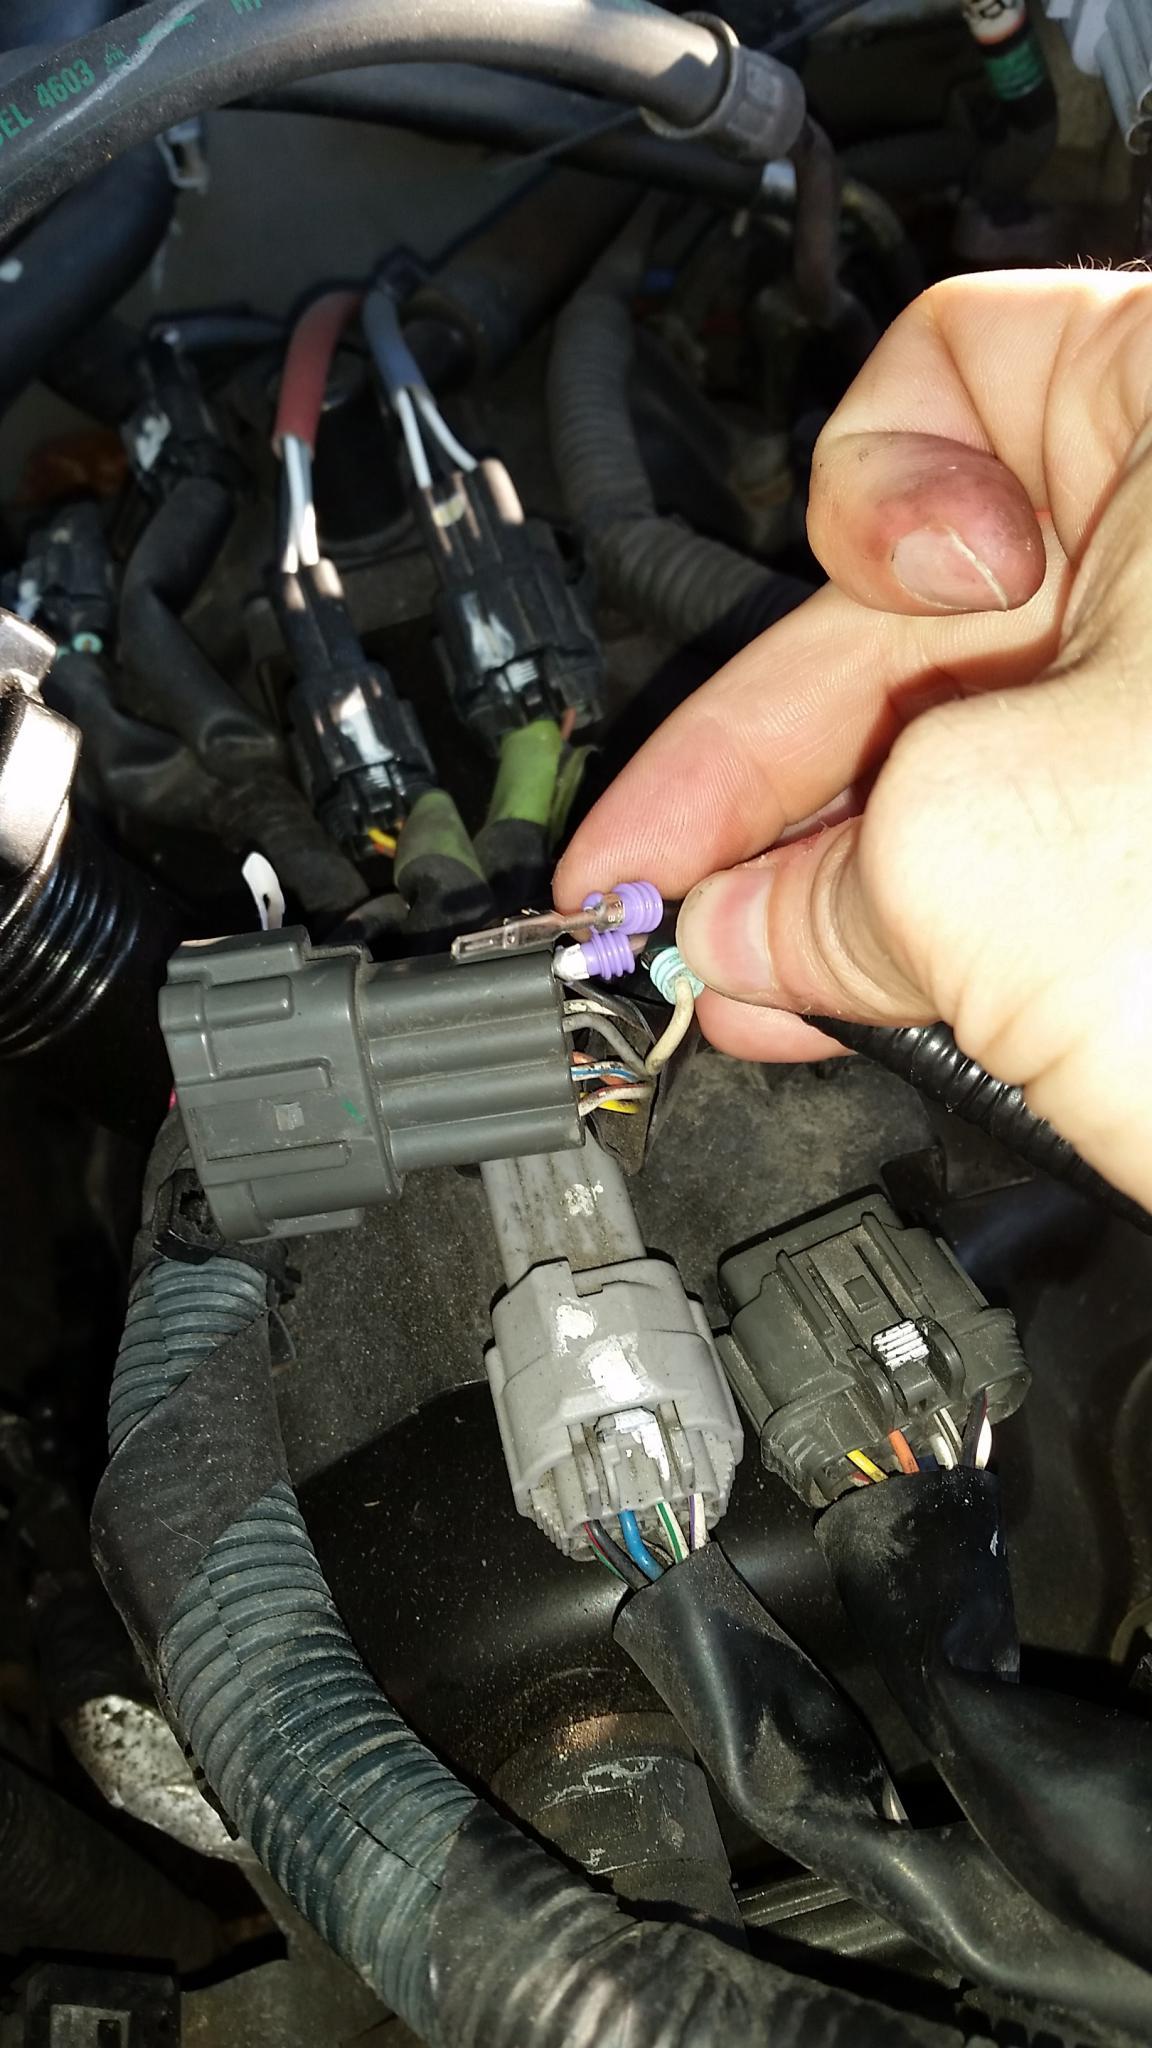 D Knock Sensor Location Help Dsc besides Maxresdefault additionally D Heads Knock Sensor Harness Heads also Hx Jeq besides D Knock Sensor Relocation How Plug. on knock sensor location